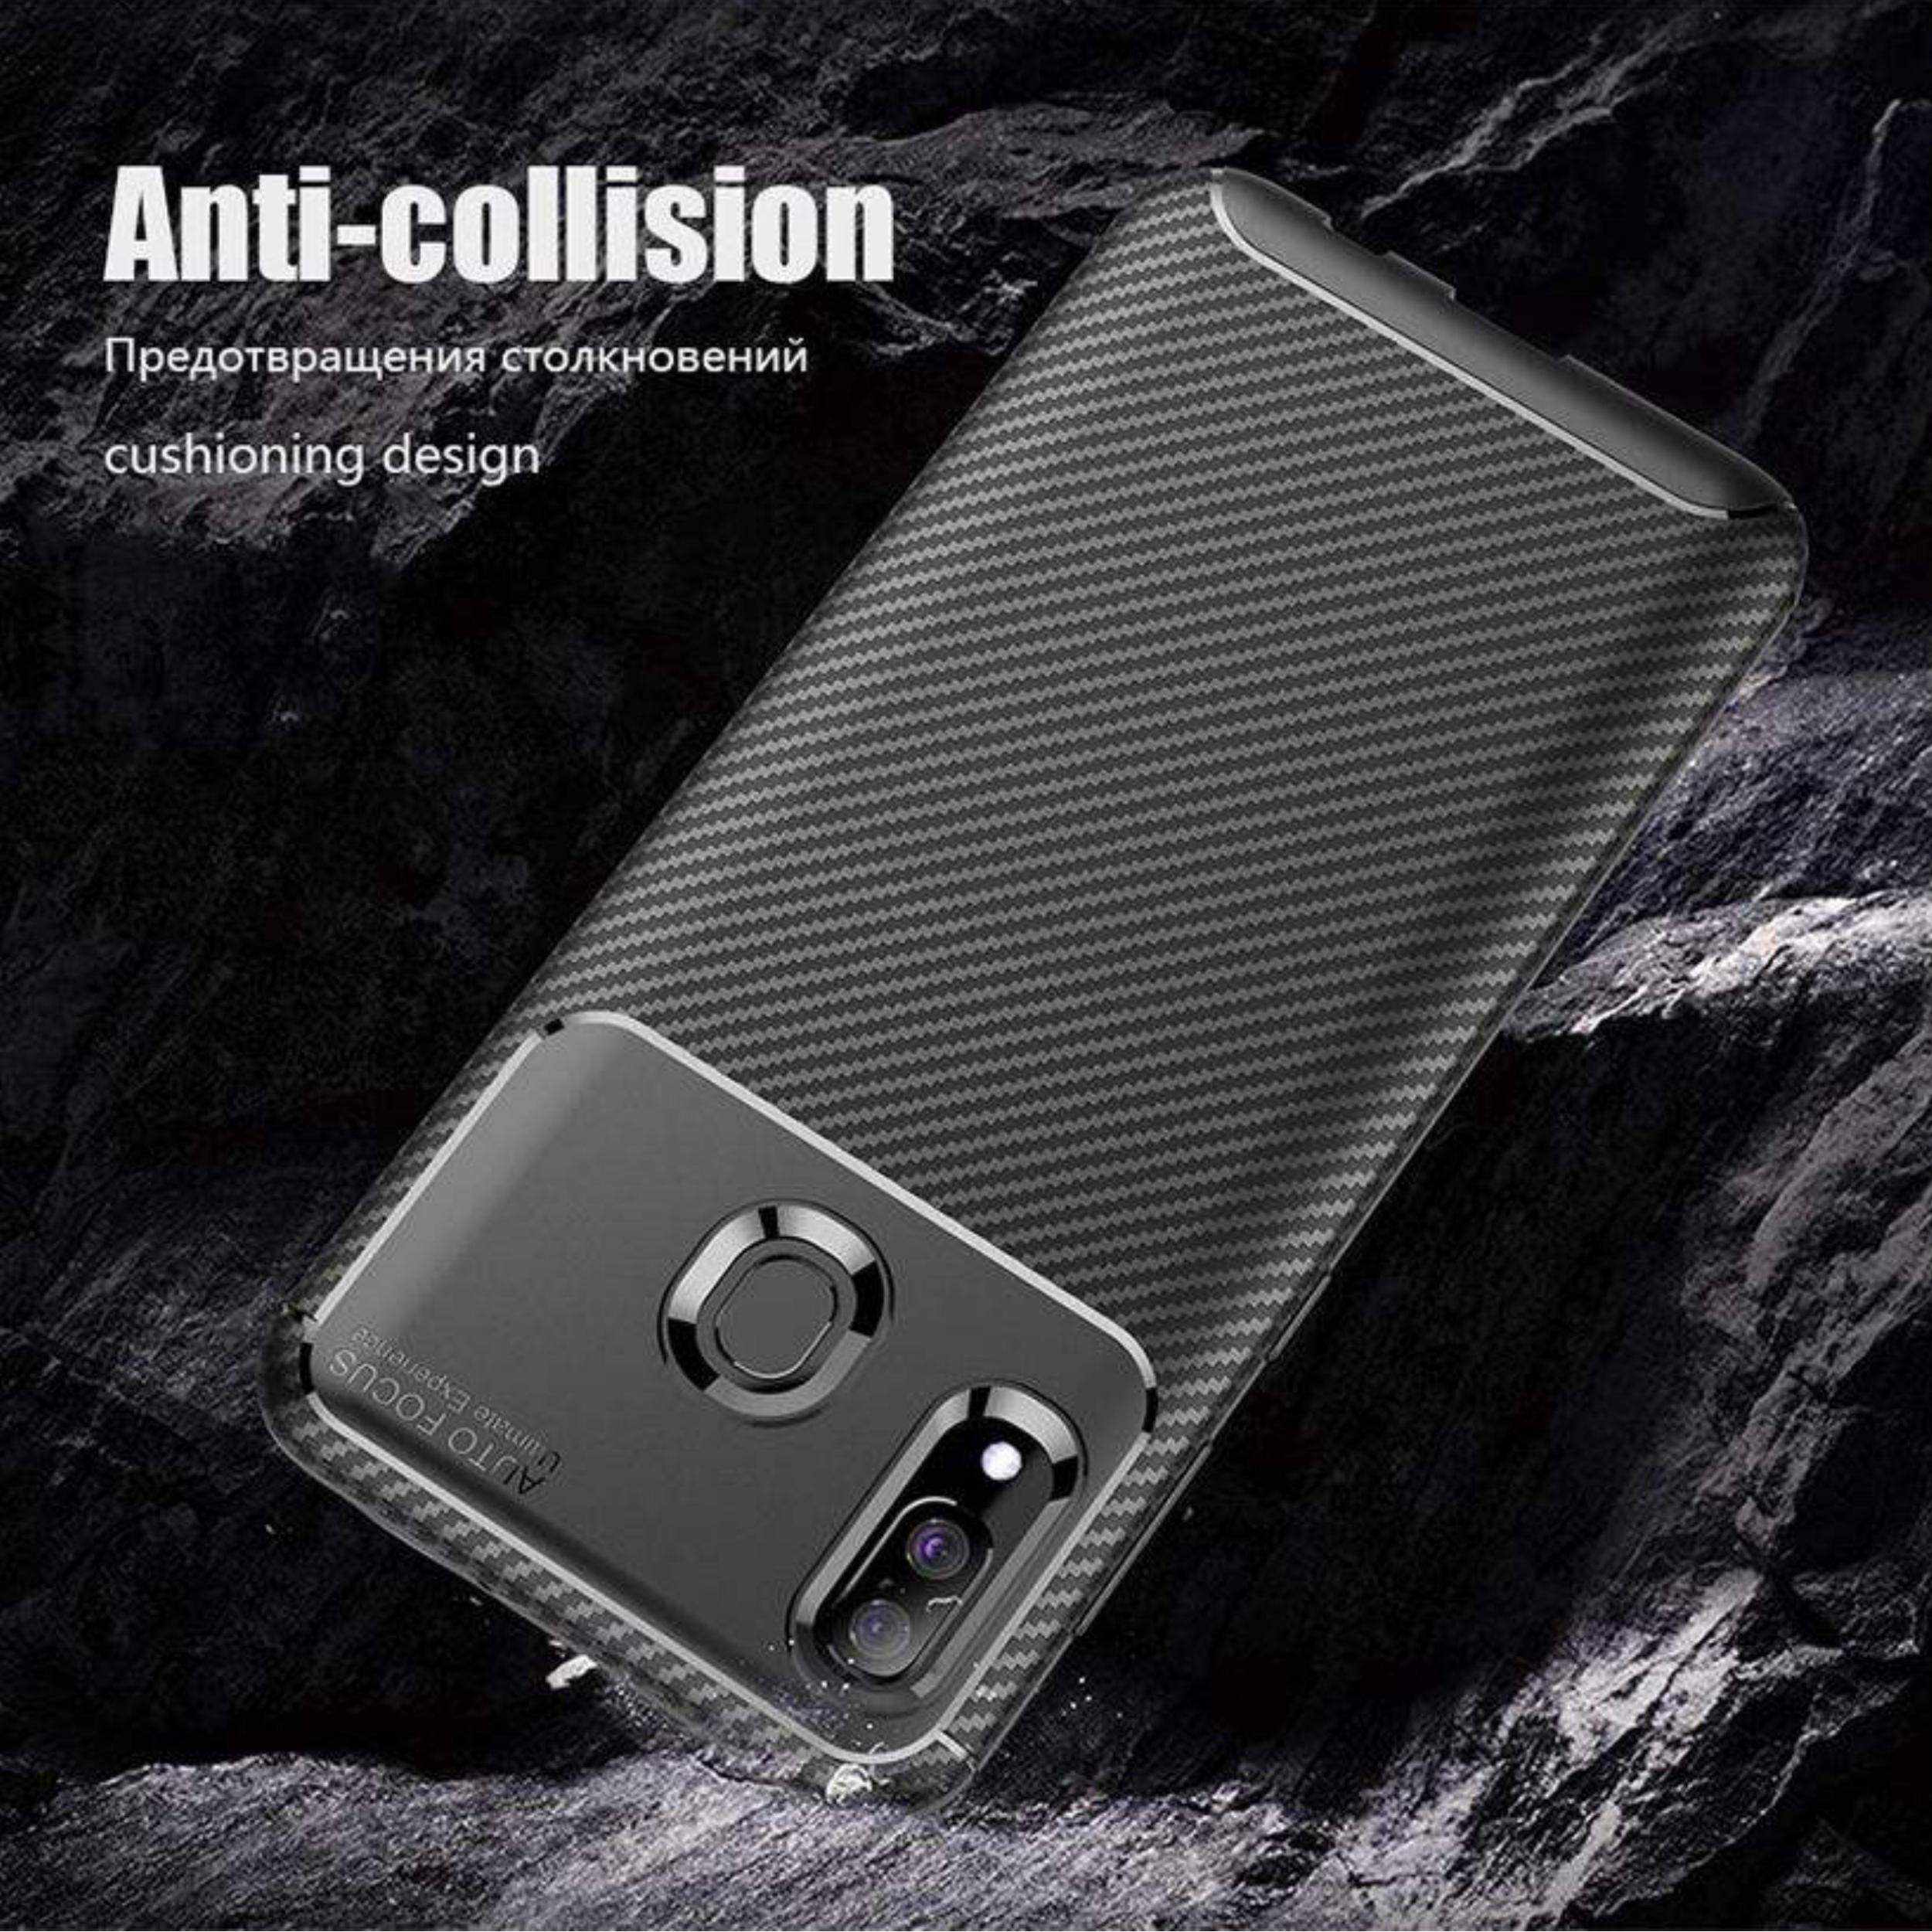 کاور لاین کینگ مدل A21 مناسب برای گوشی موبایل سامسونگ Galaxy A20/ A30/M10s thumb 2 4